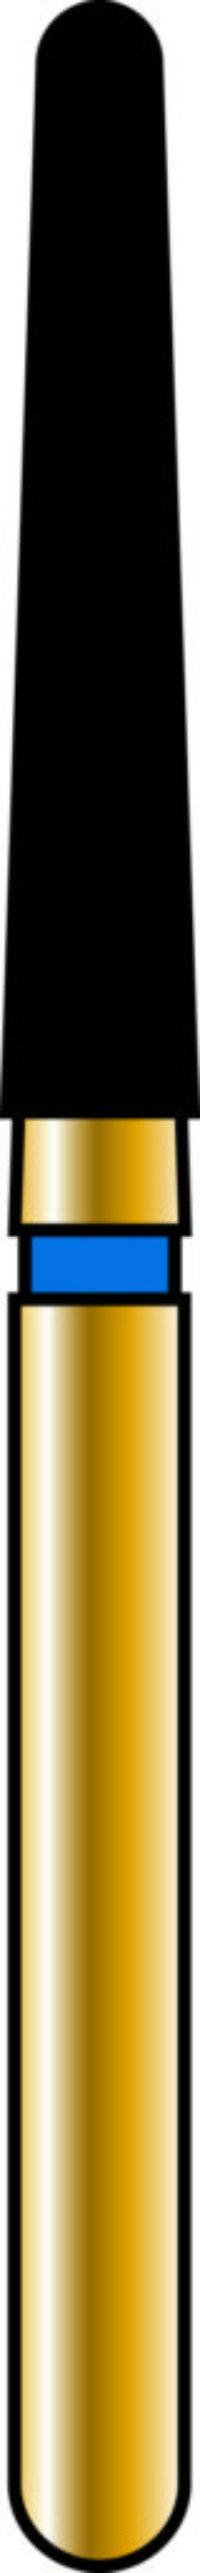 Round End Taper 18-10mm Gold Diamond Bur